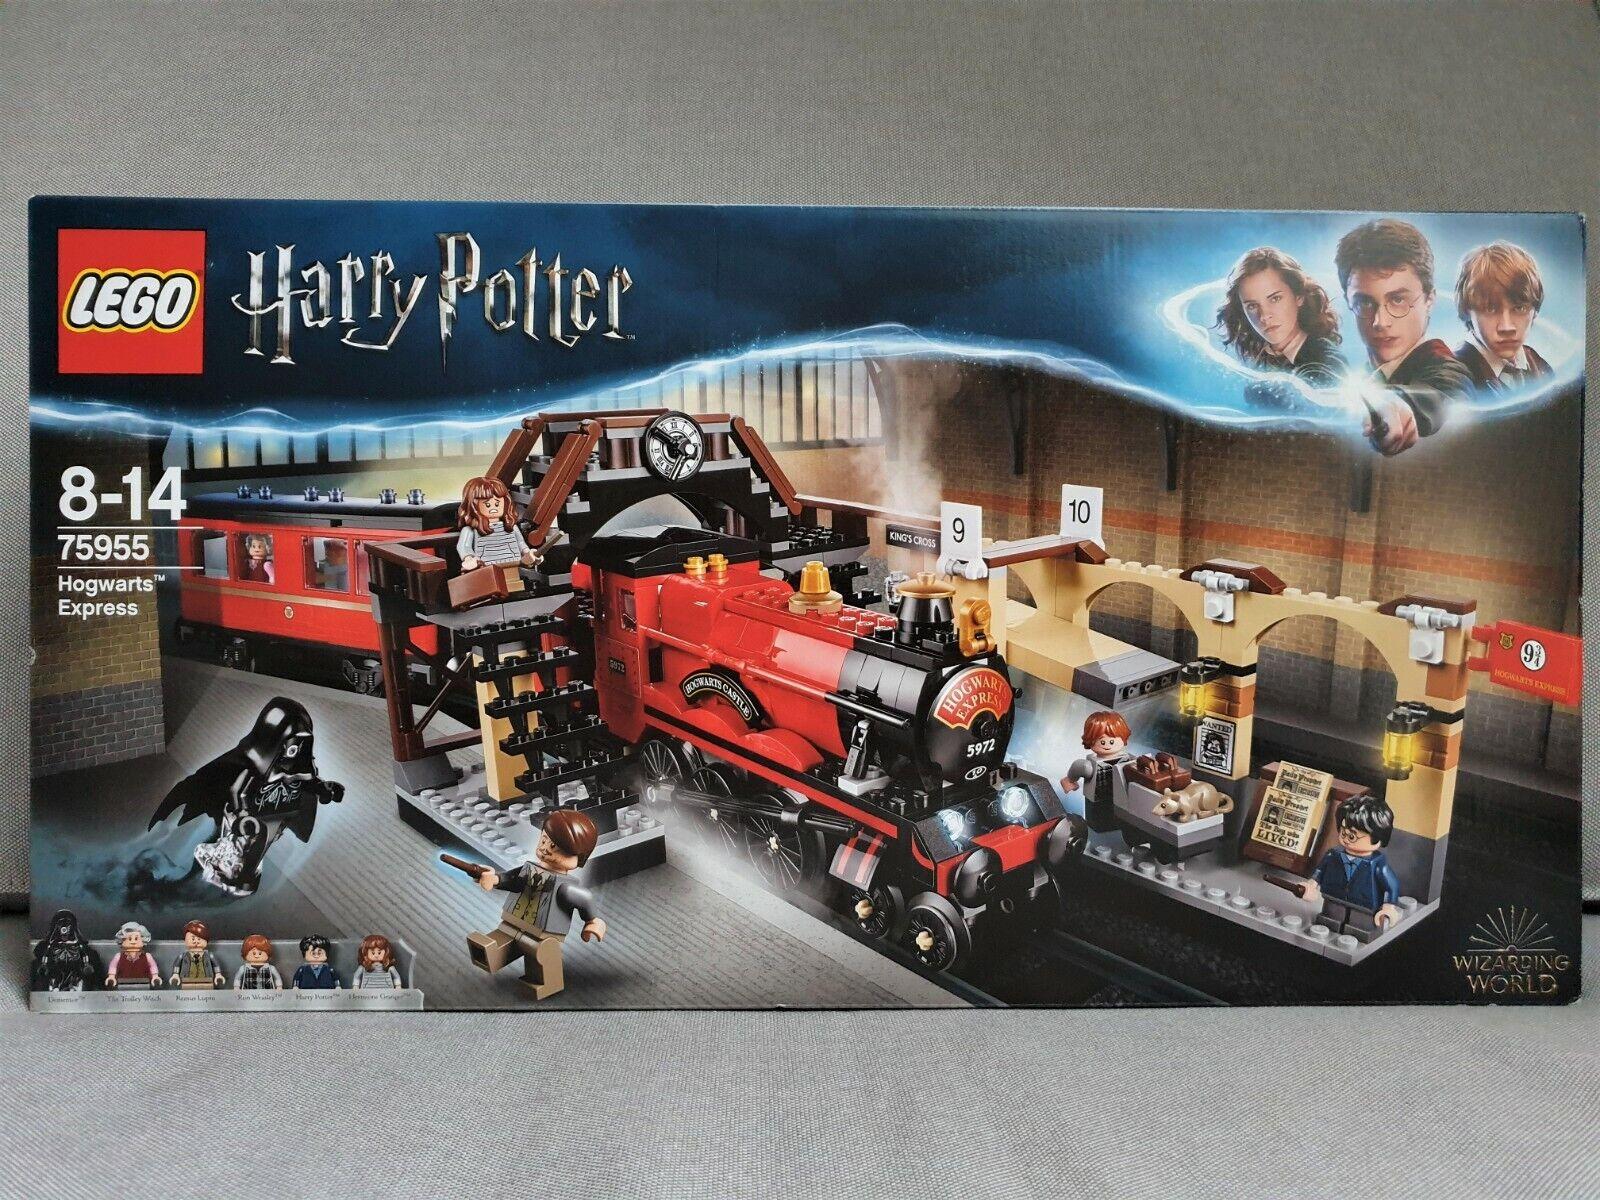 LEGO Harry Potter - 75955  Hogwarts Express - NEU & OVP ungeöffnet - 6 Figuren